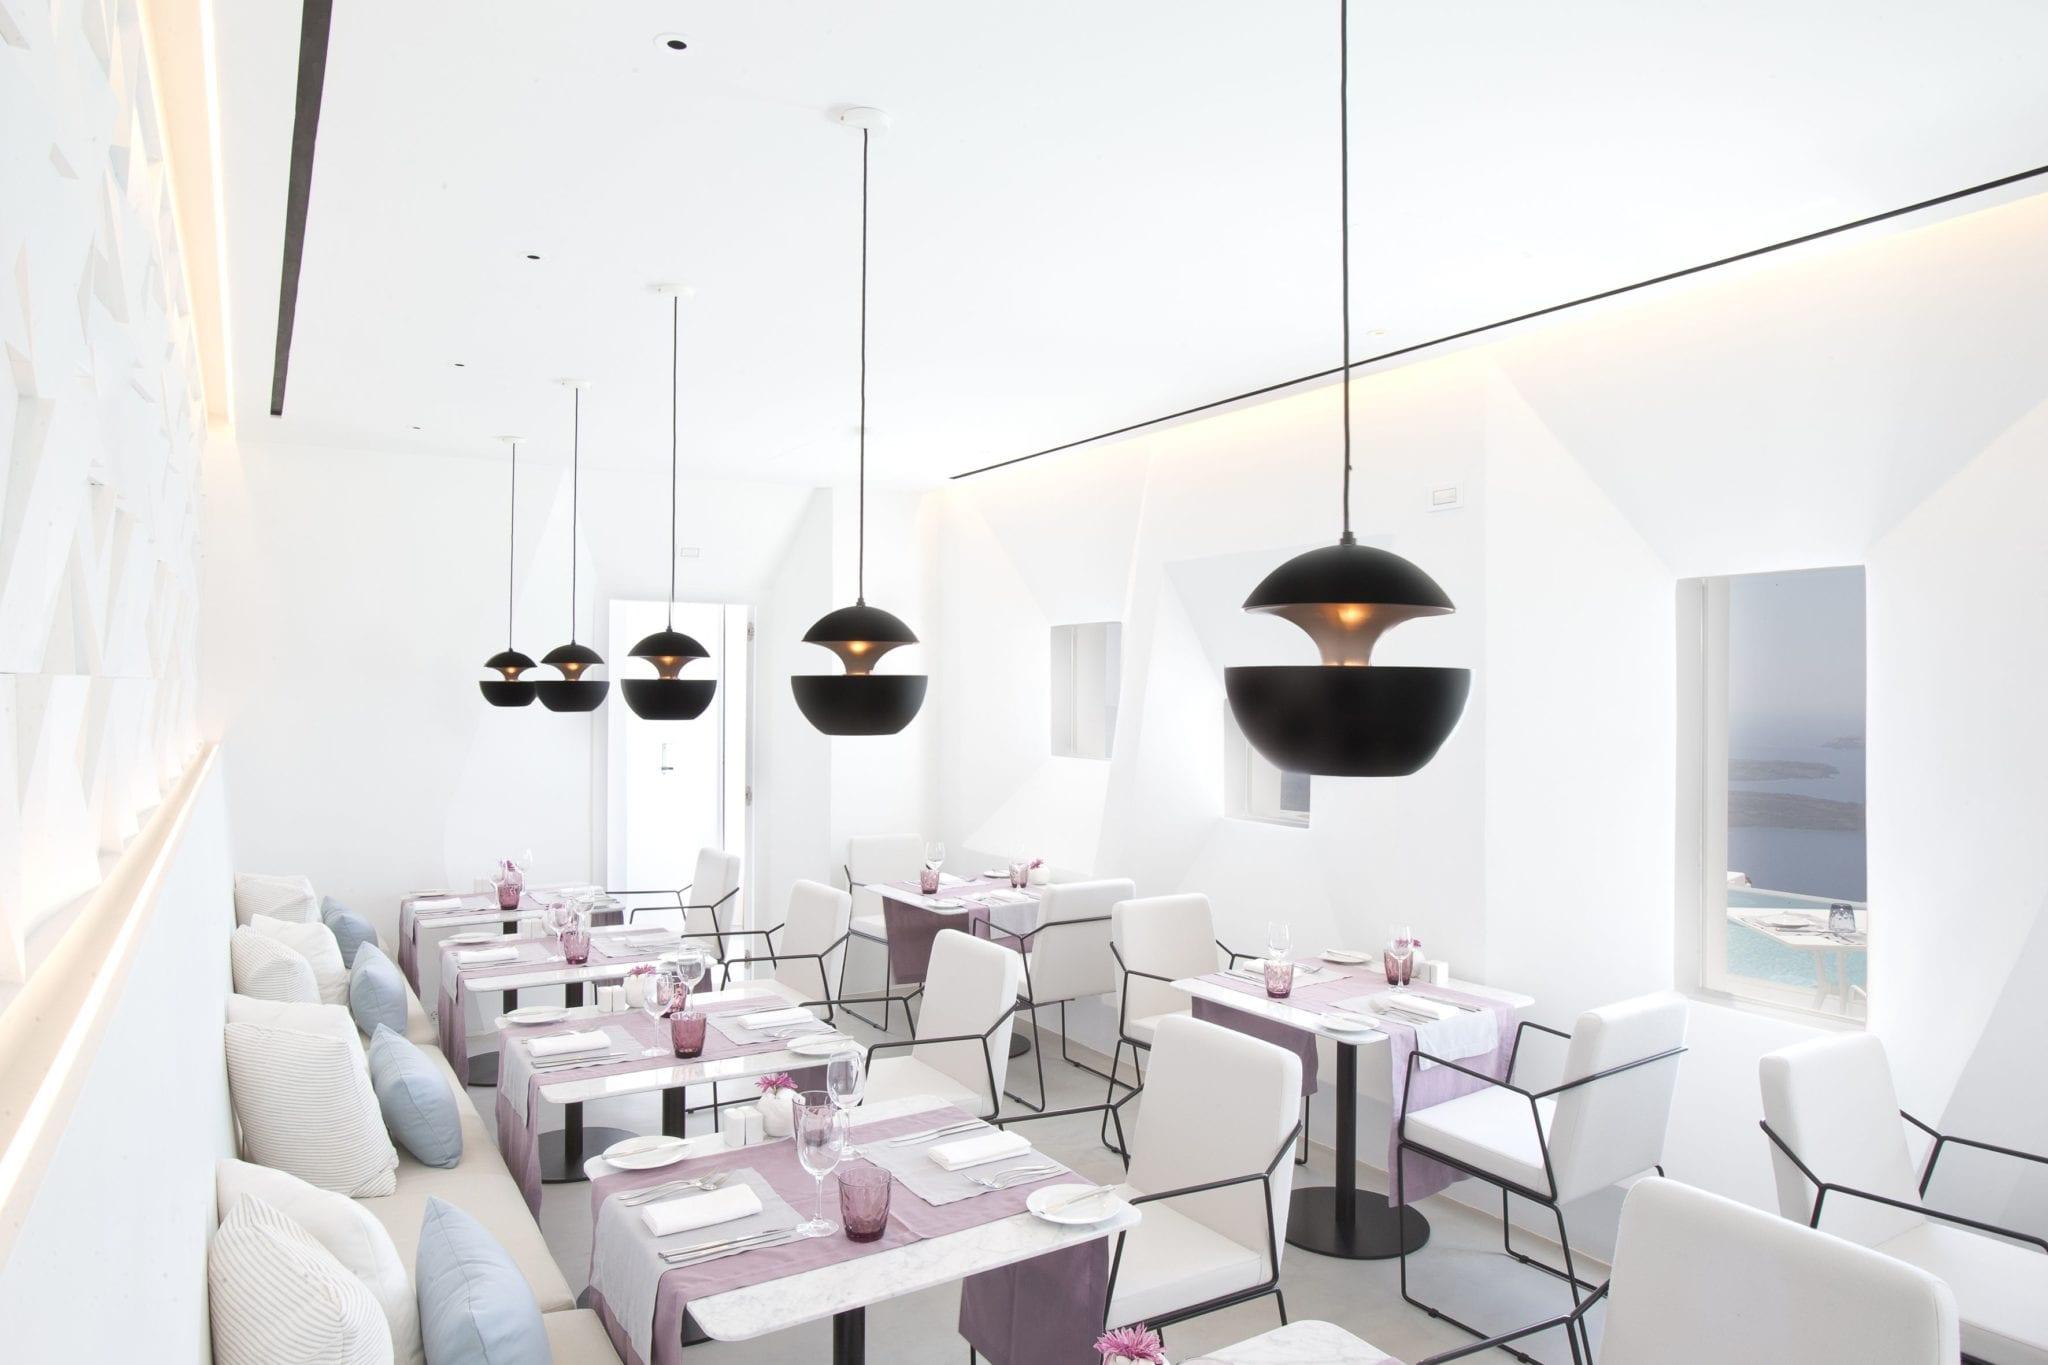 Santoro Restaurant- interior